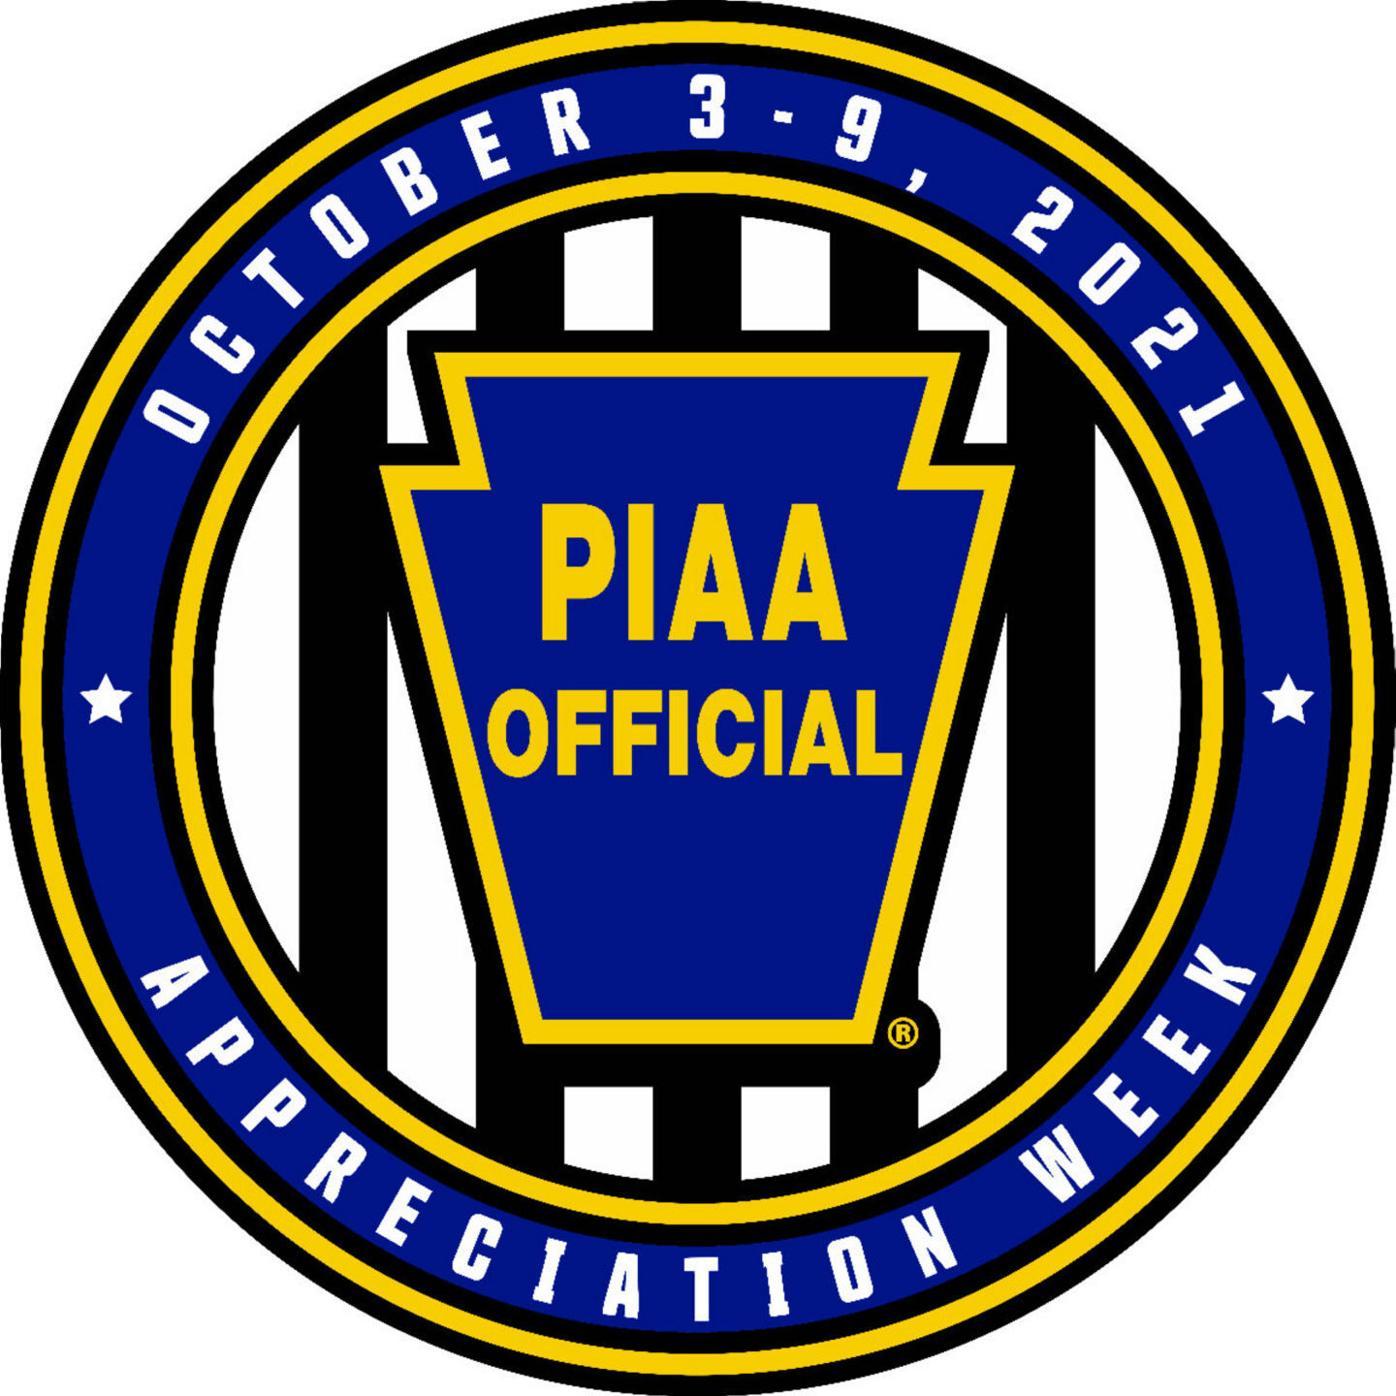 PIAA_OFFICIALS_WEEK_LOGO